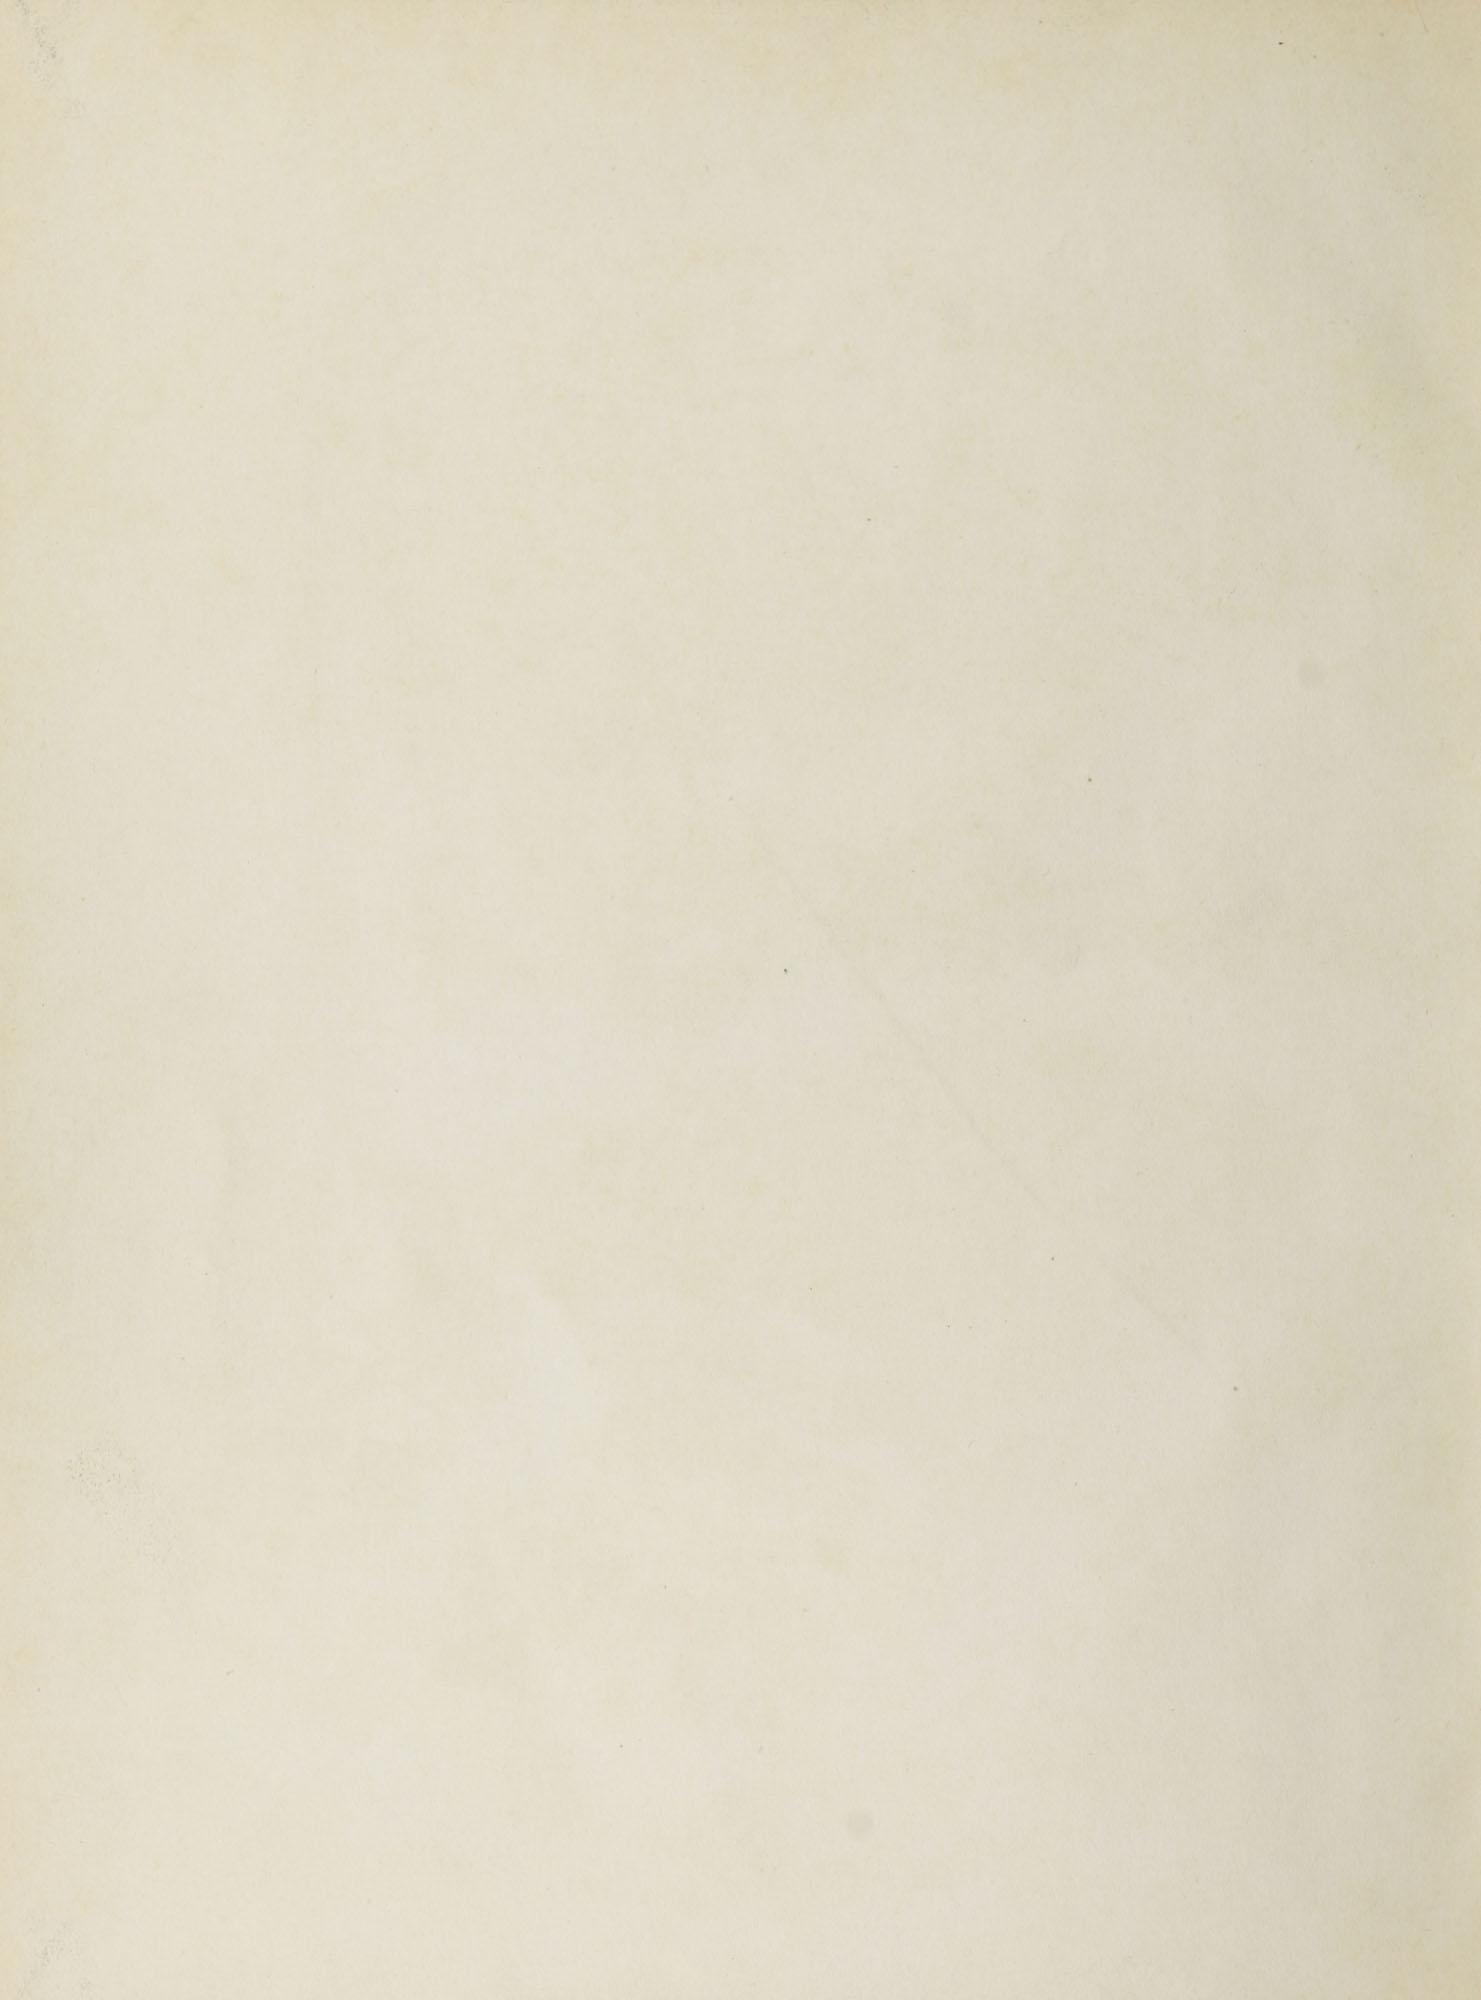 College of Charleston Magazine, 1937-1938, blank page